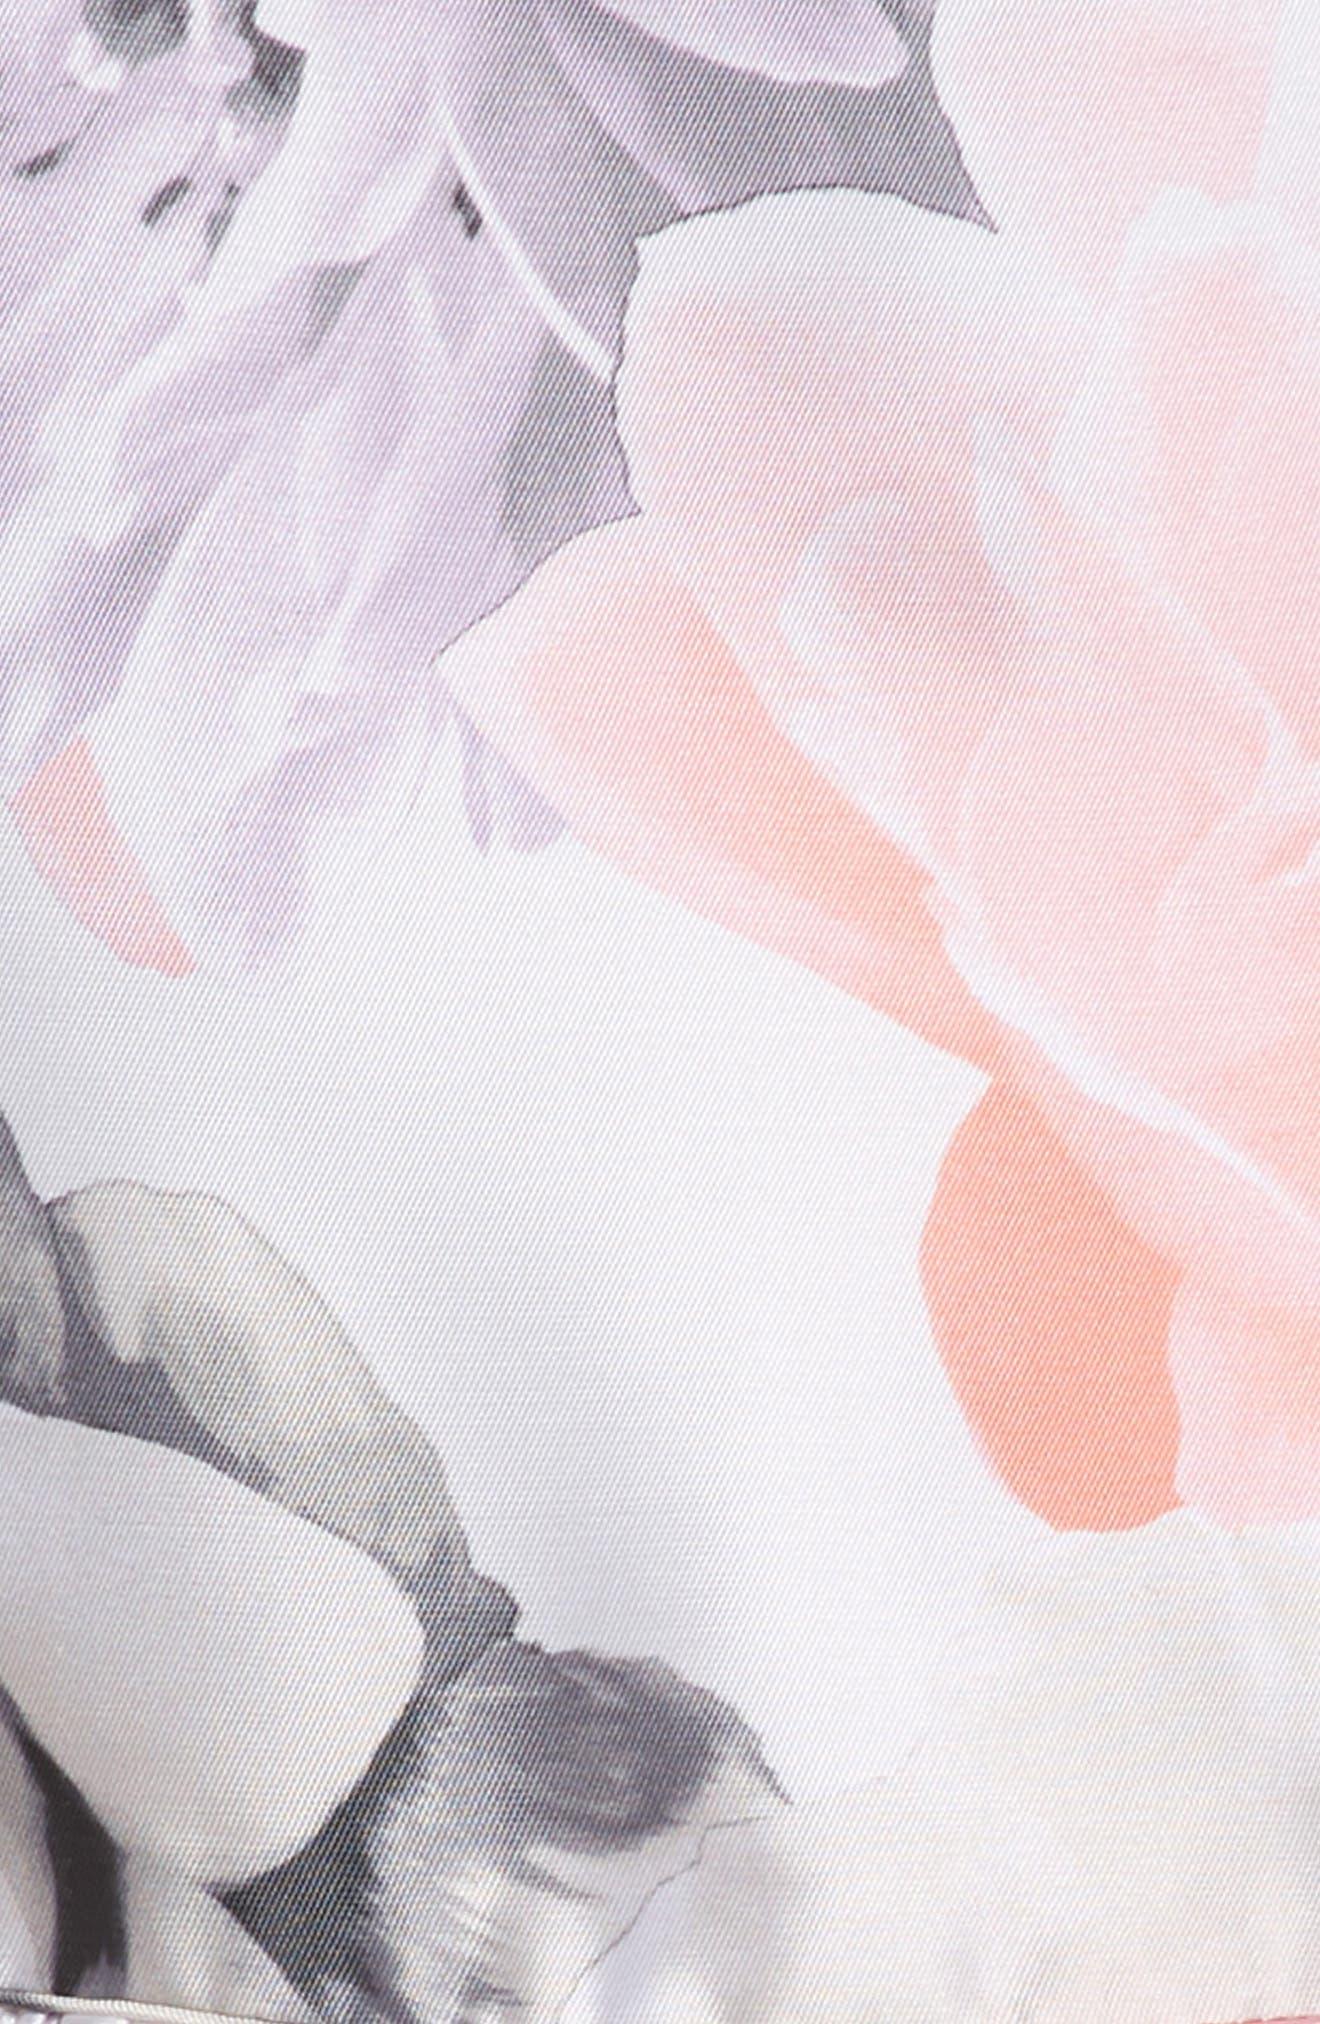 Floral Print Party Dress,                             Alternate thumbnail 2, color,                             Ivory